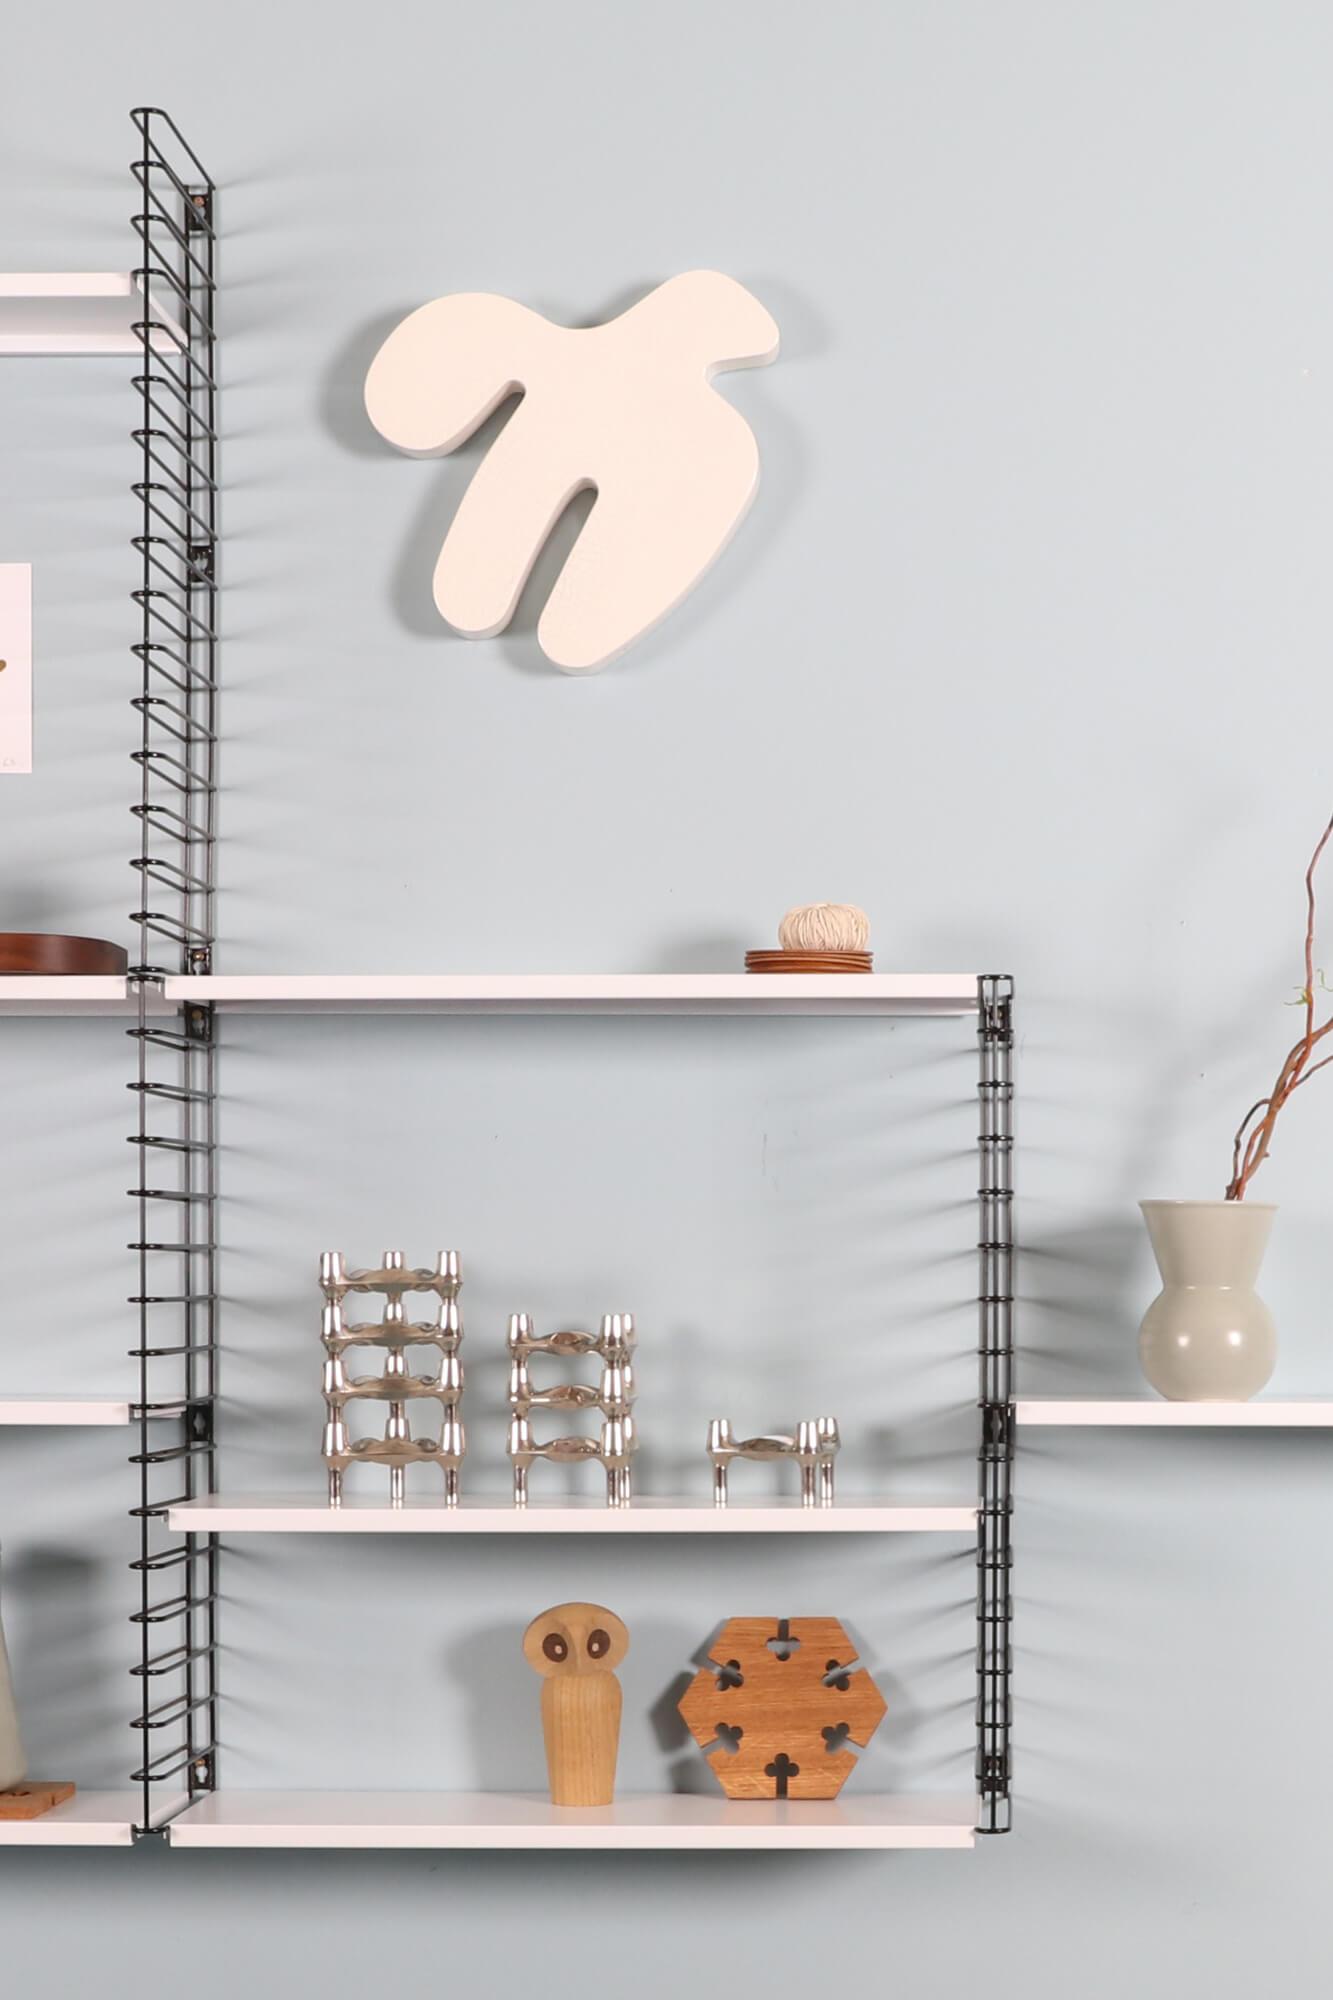 Good Form: Adriaan Dekker Shelving System – Black and White Tomado